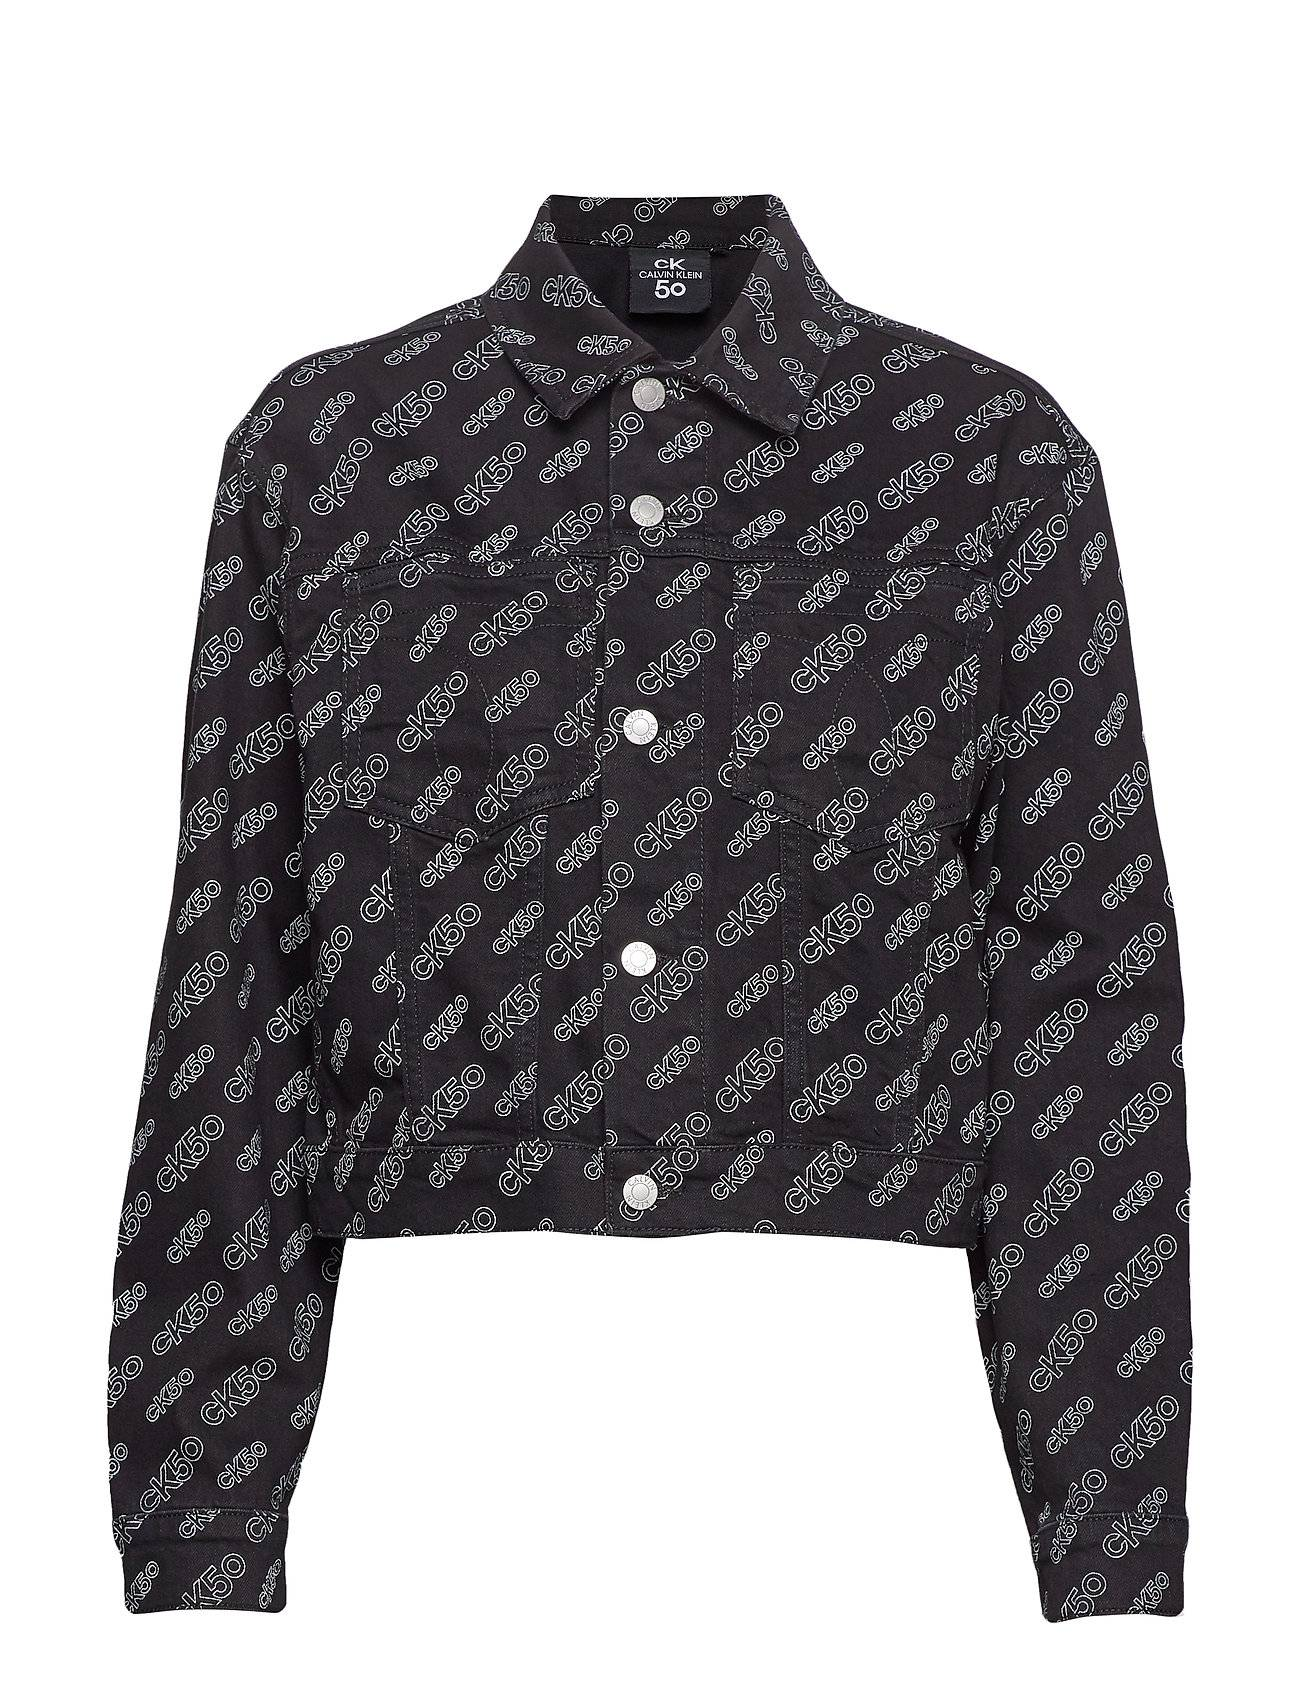 Image of Calvin Cropped Omega Denim Jacket Farkkutakki Denimtakki Musta Calvin Klein Jeans